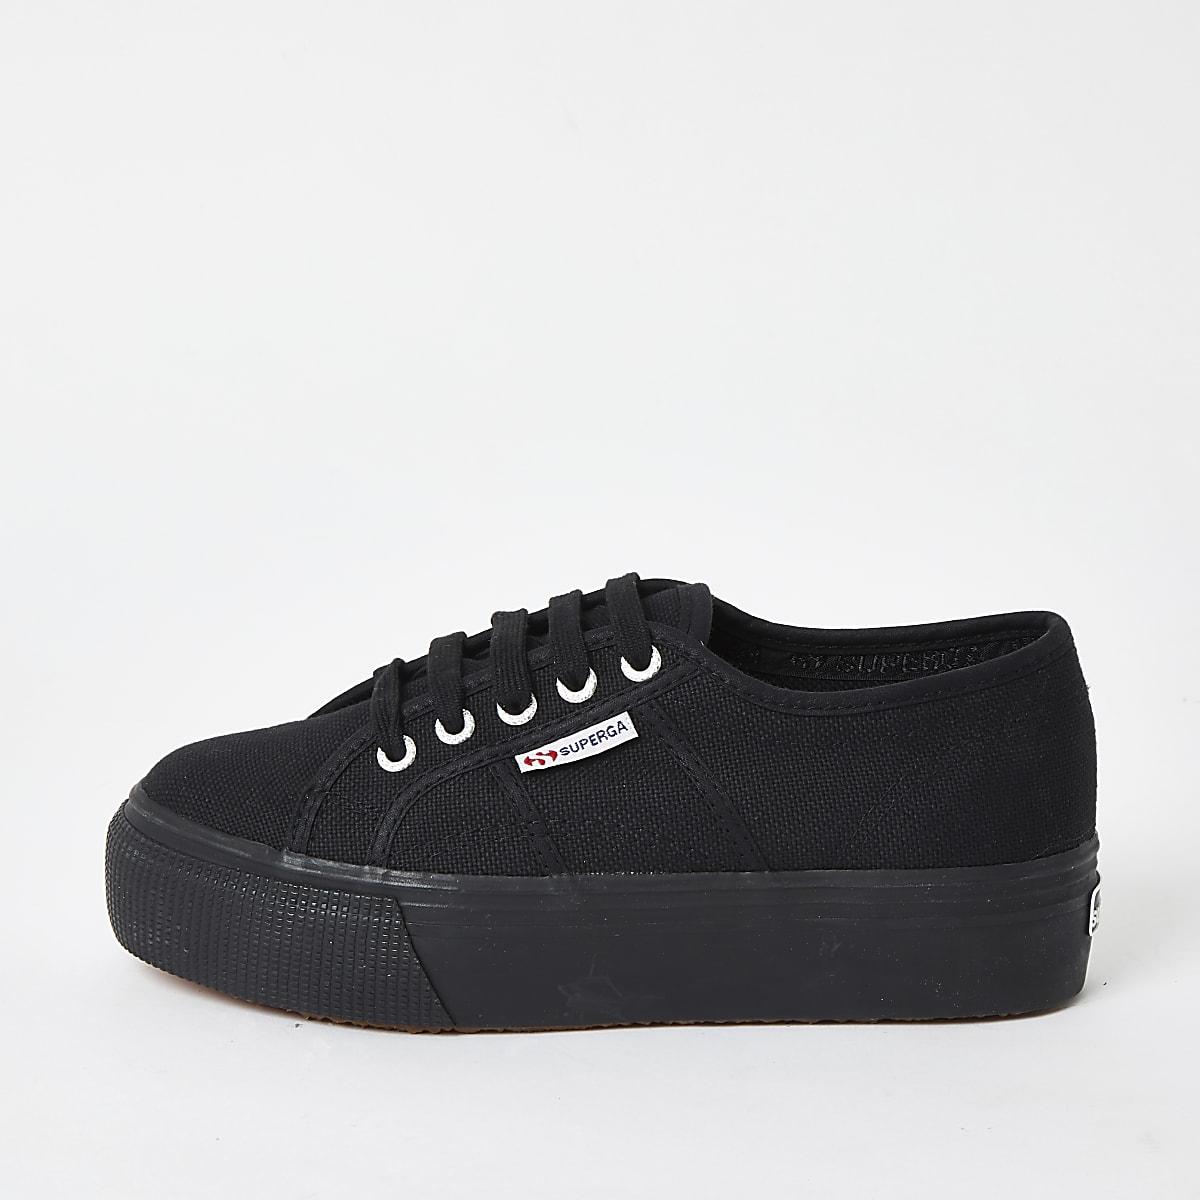 7b3b10258 Superga black flatform runner trainers - Trainers - Shoes & Boots - women